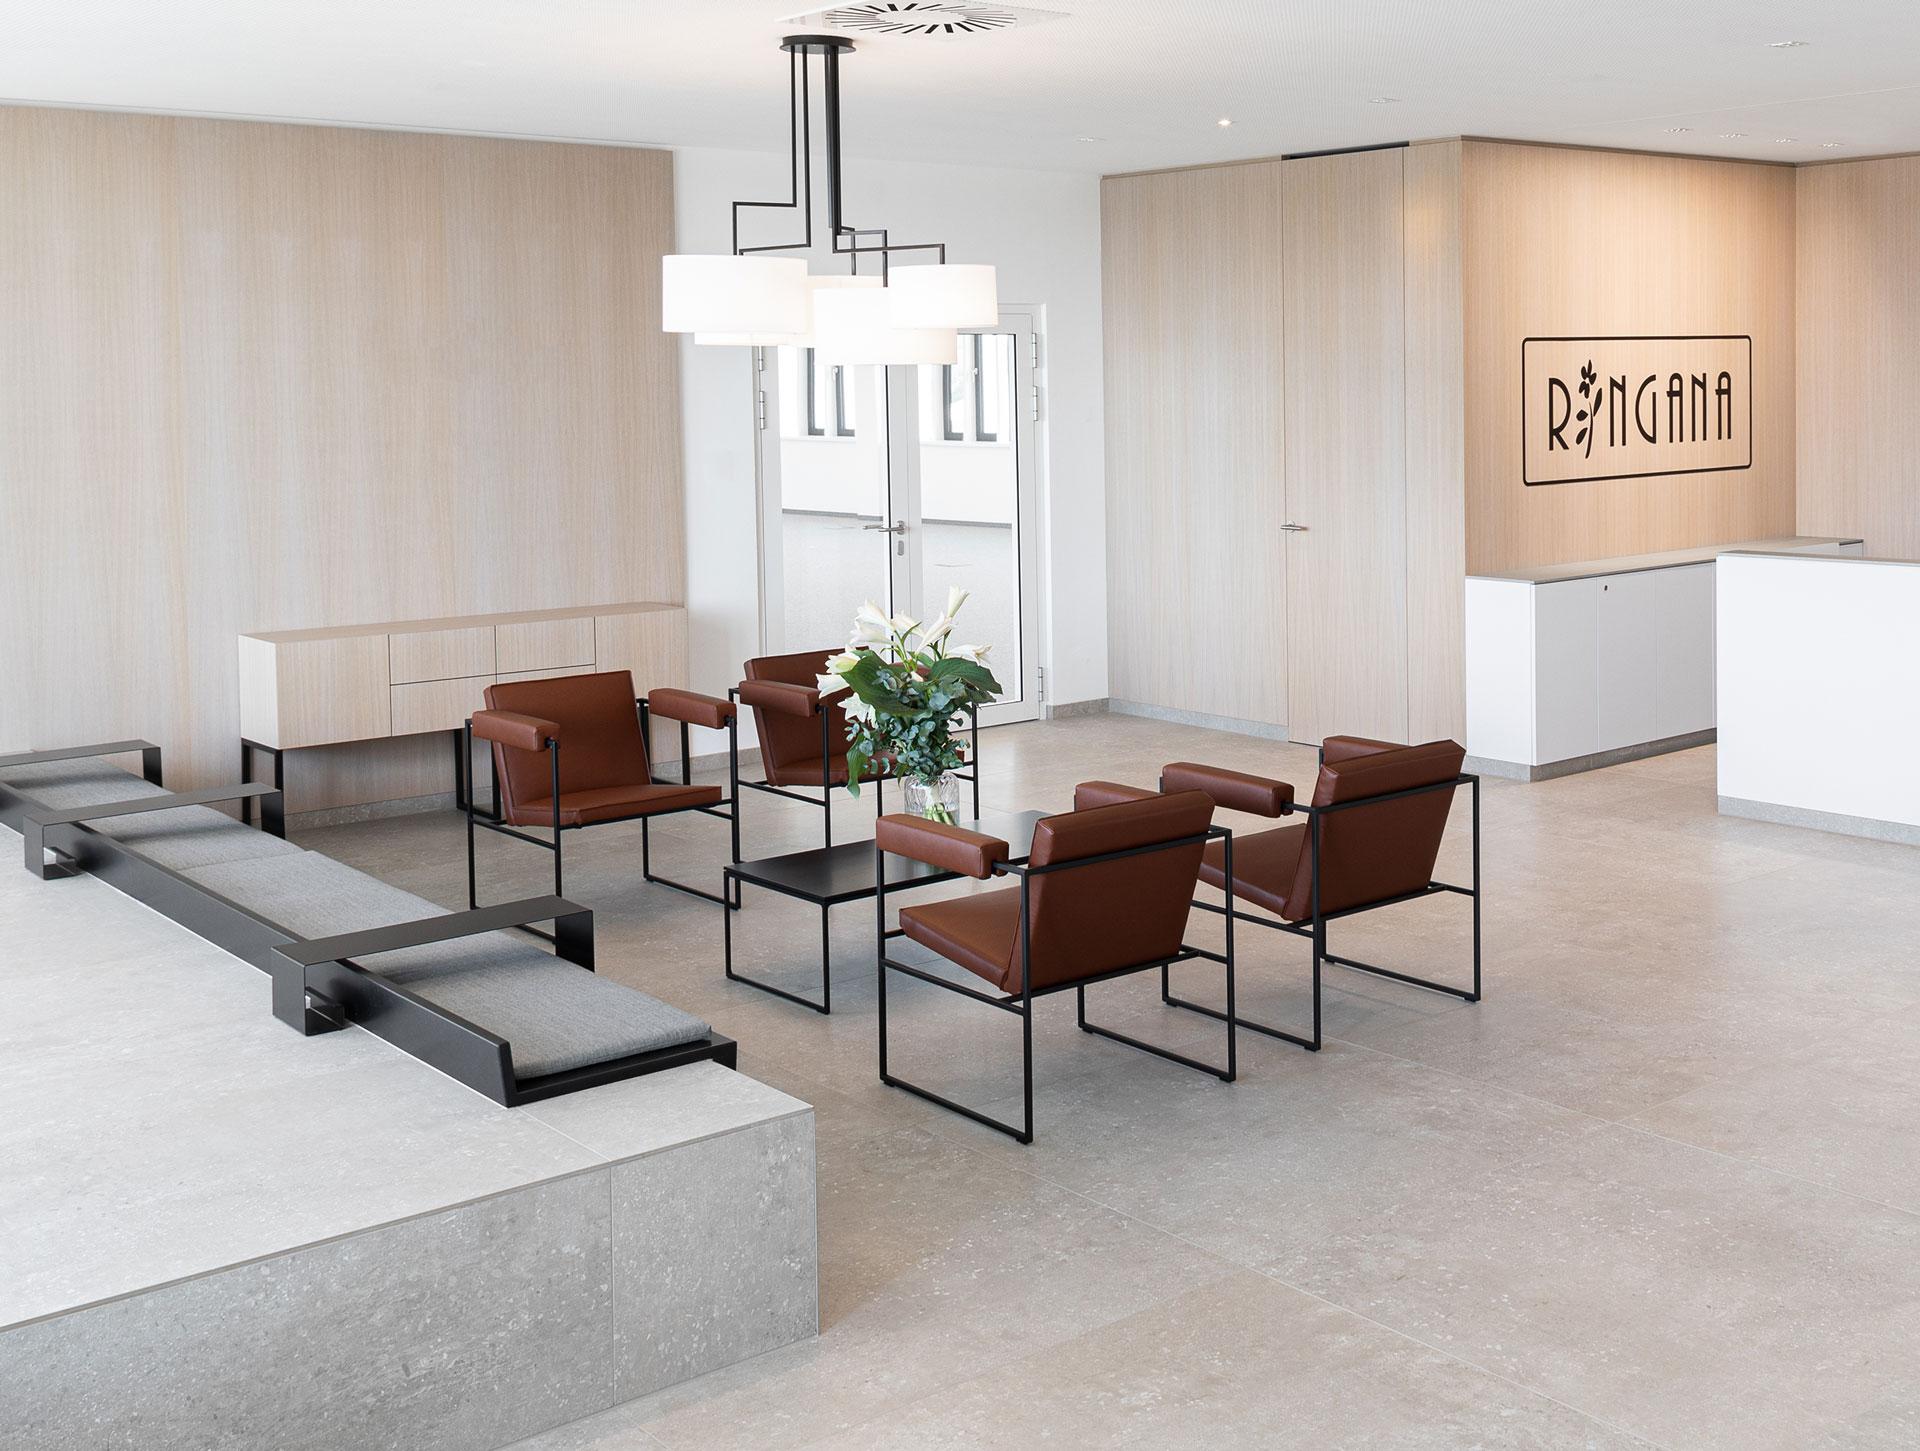 Ringana, interior design, design, innenarchitektur, office design, lounge, büro, möbel, designed von studio thörnblom